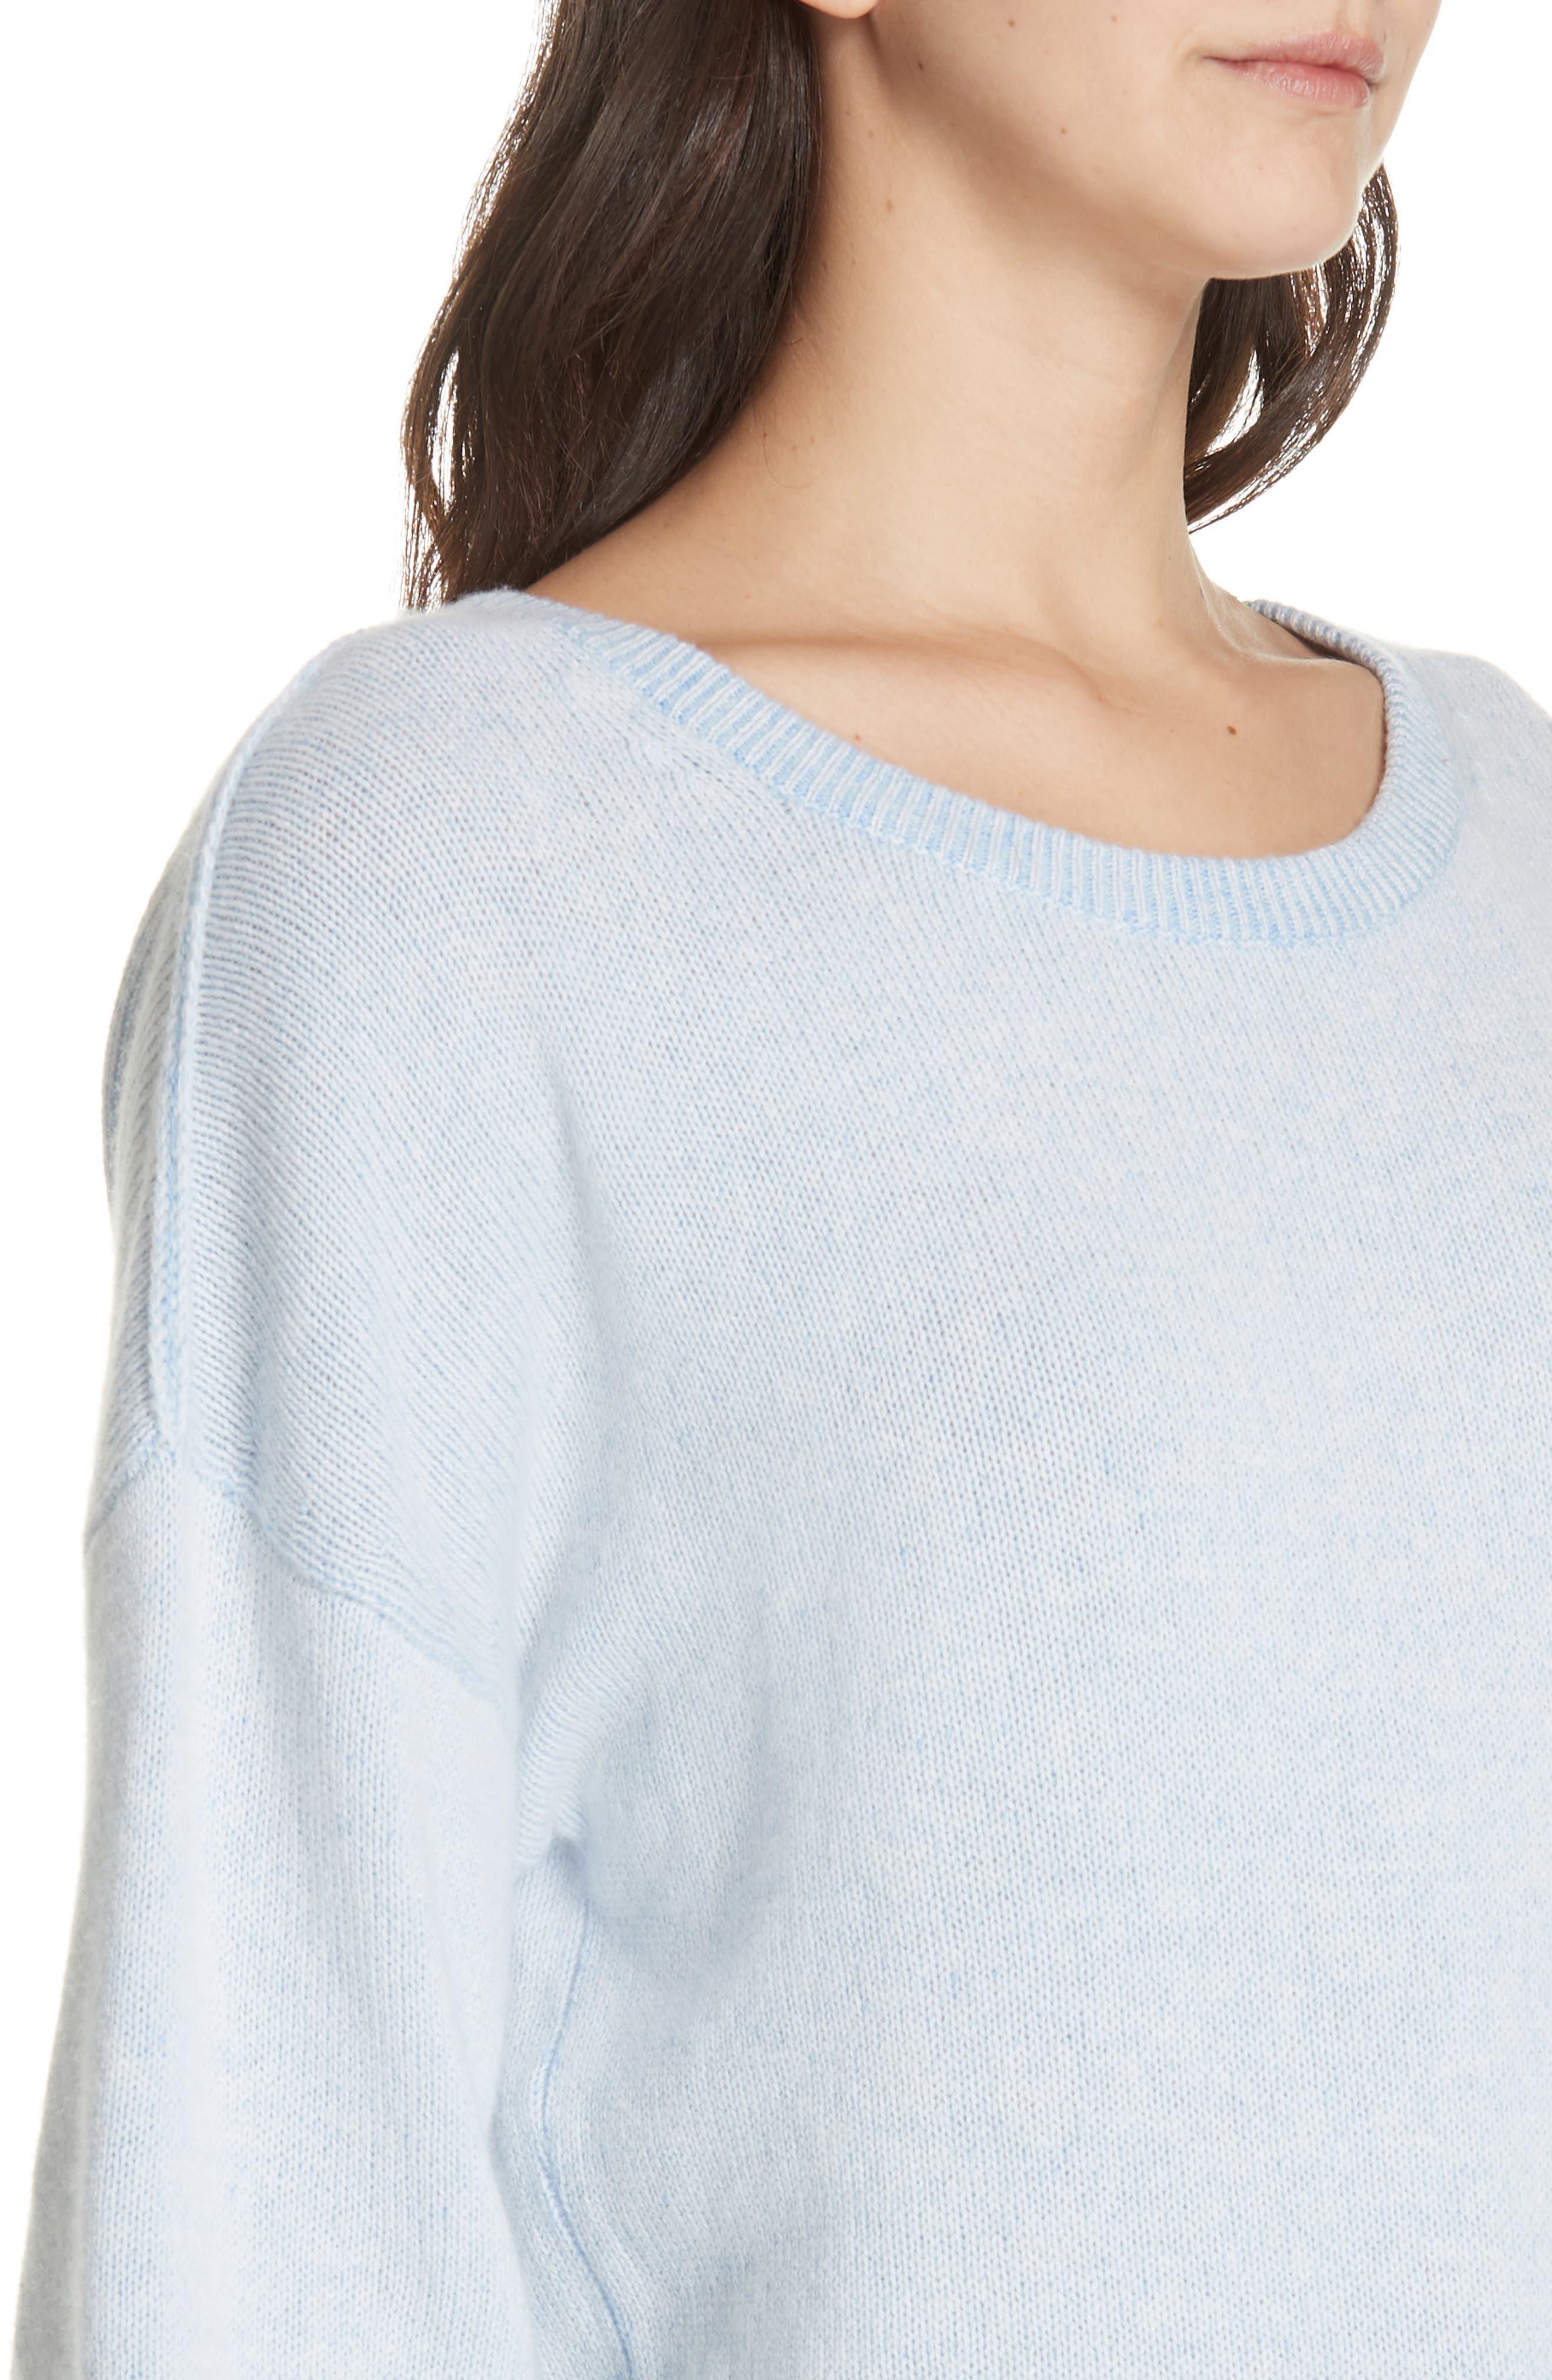 Alta Cashmere Sweater,                             Alternate thumbnail 4, color,                             SKYLAR BLUE COMBO